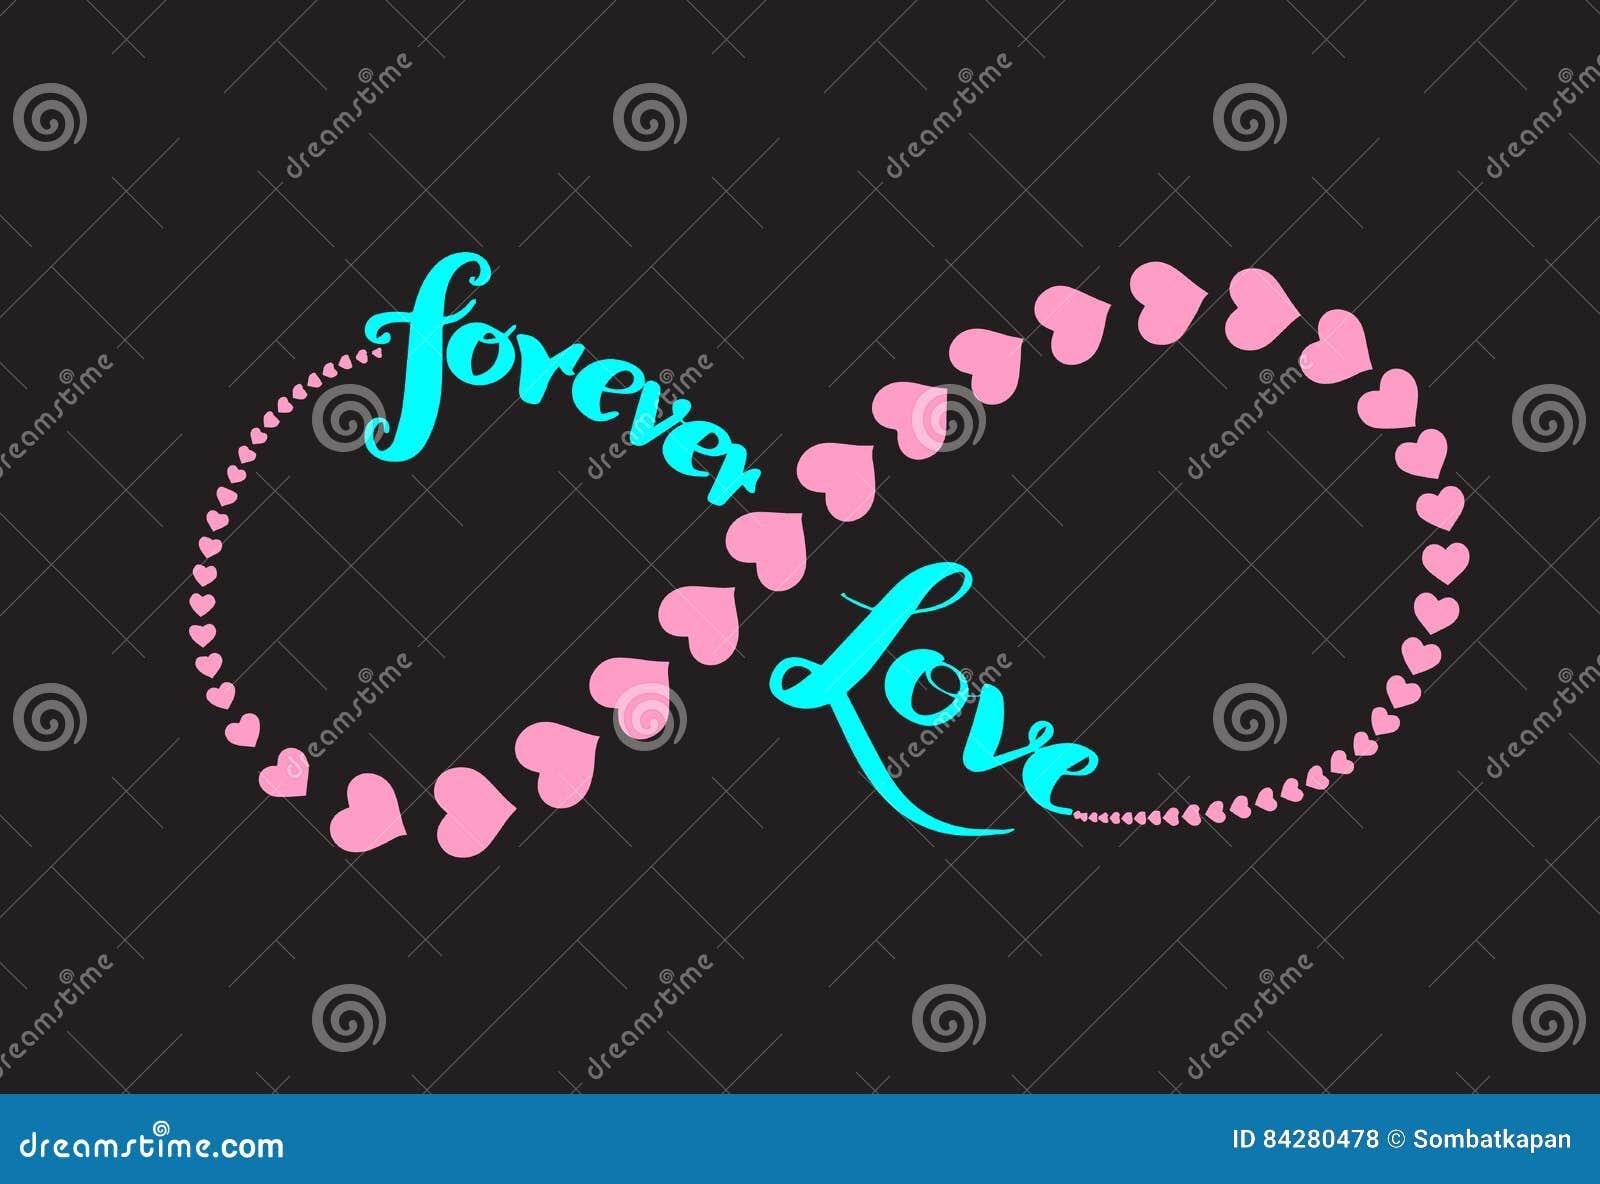 Forever Love Infinity Symbol Stock Vector Illustration Of